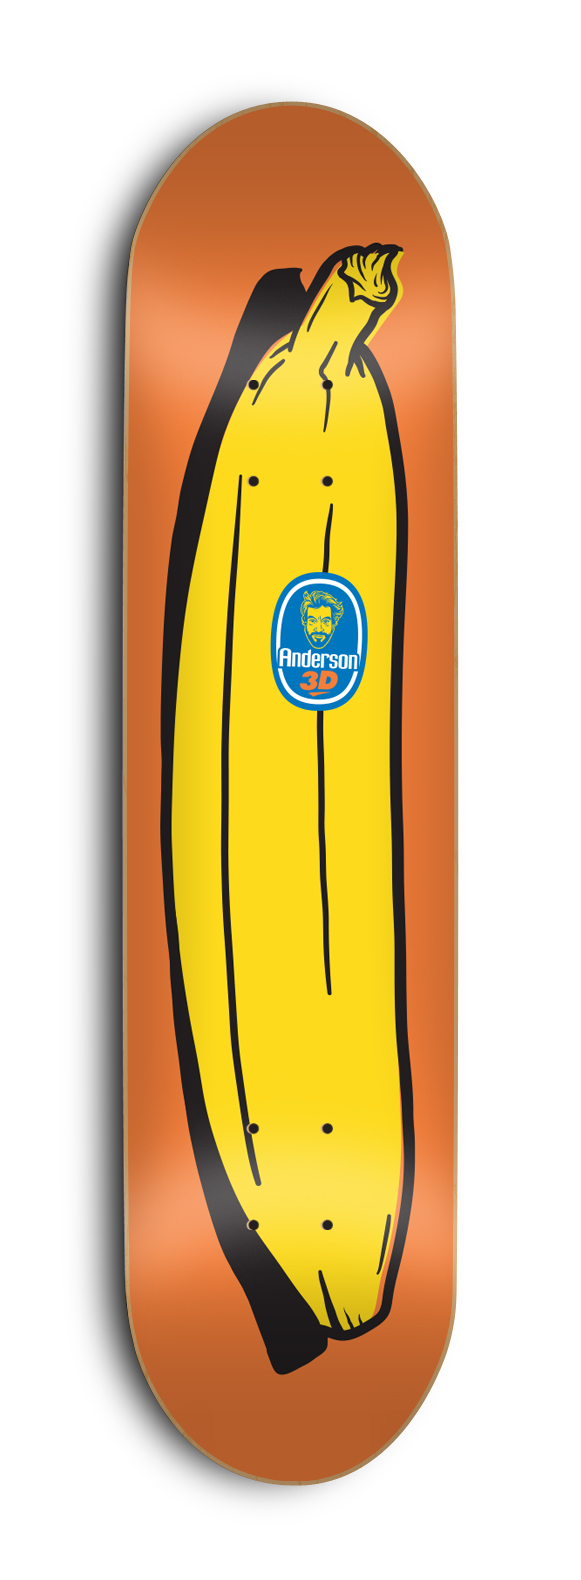 Anderson_Banana.jpg